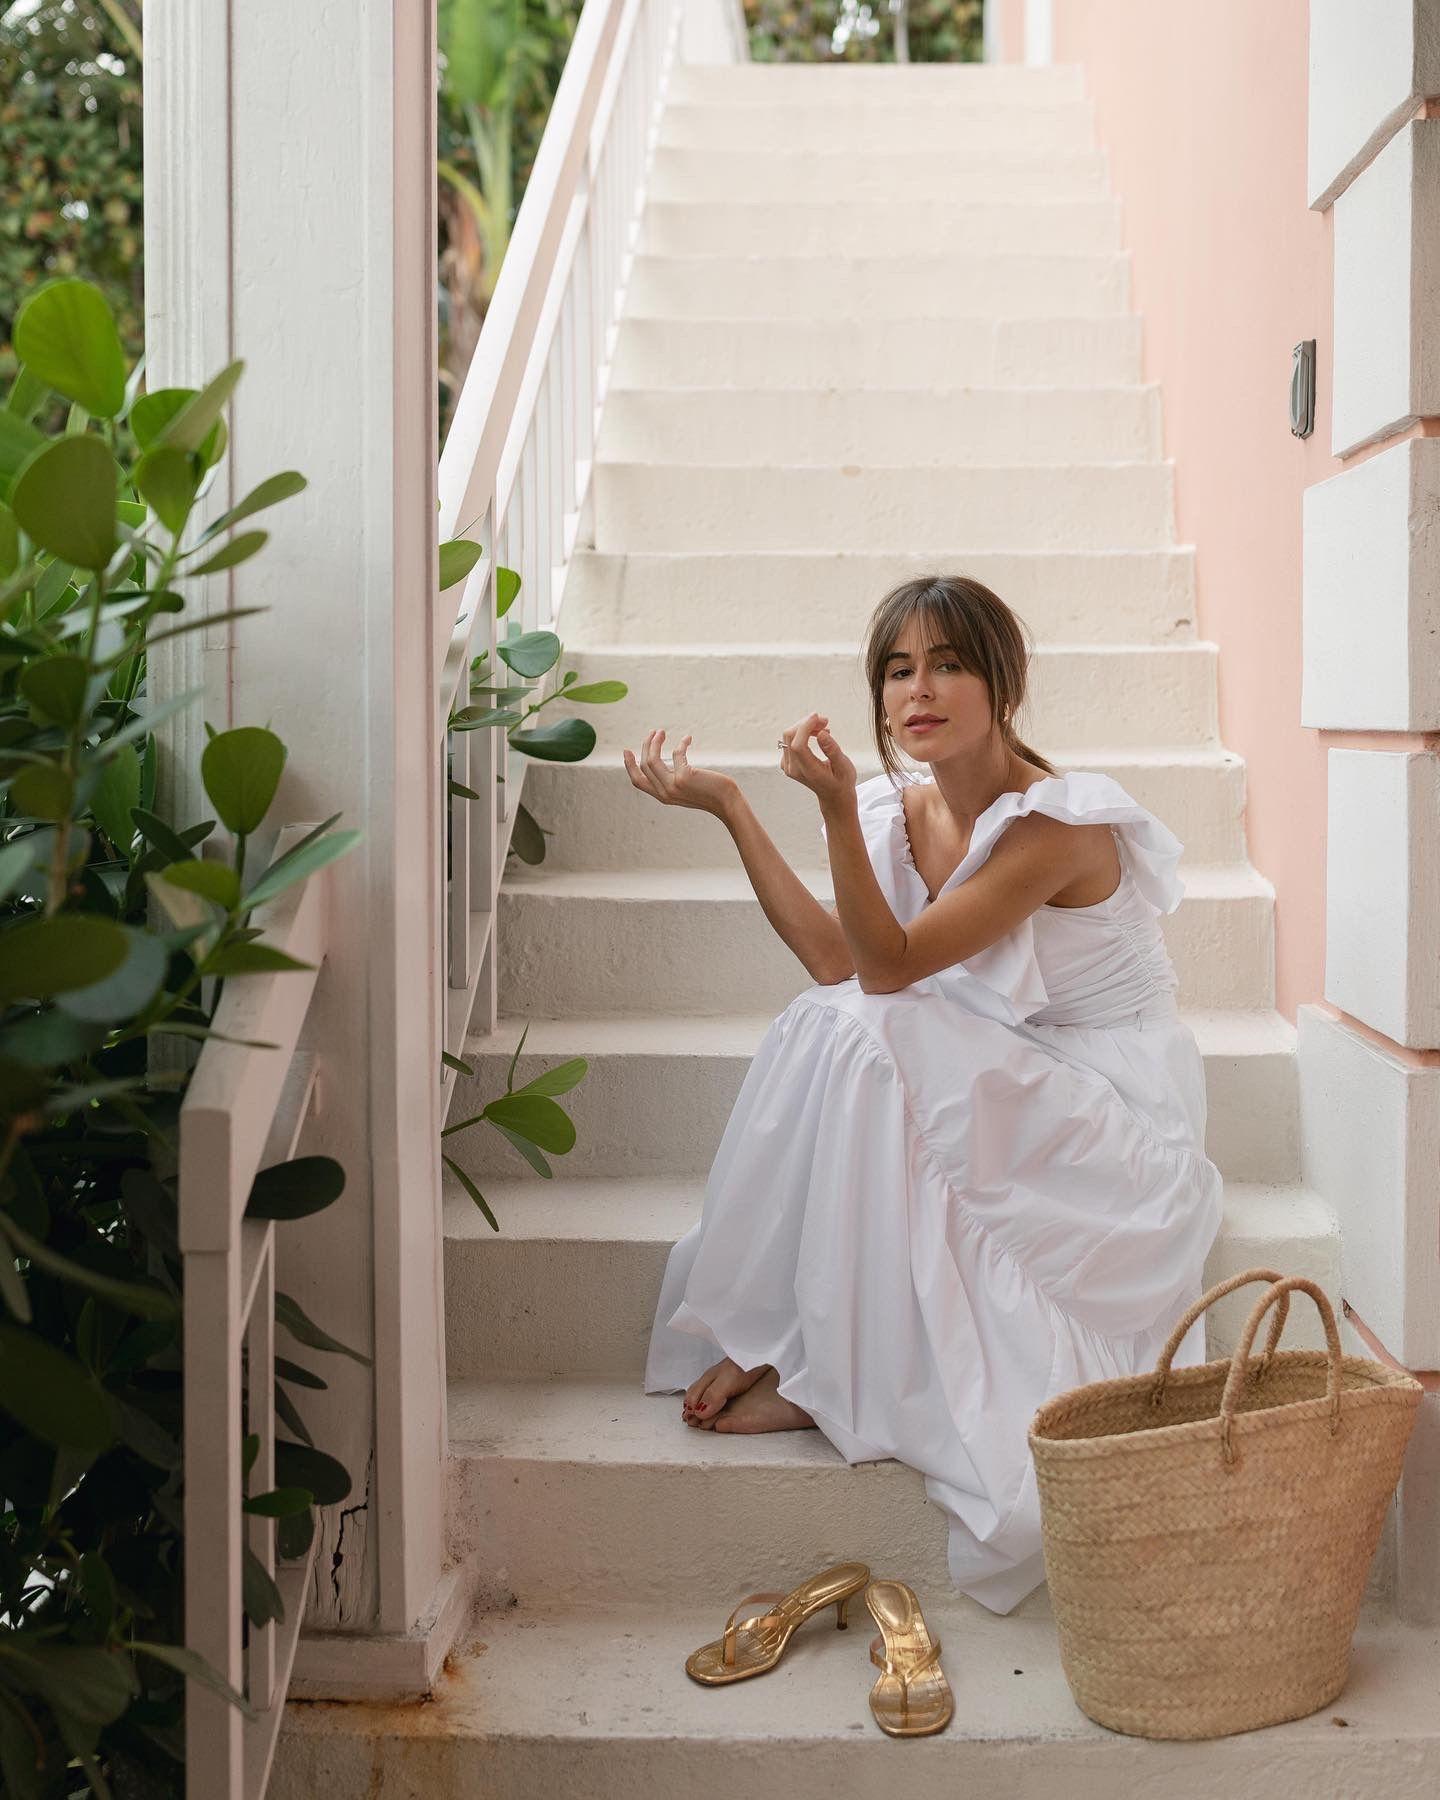 May 26 2020 Summer Chic Street Fashion Photography White Dress [ 1800 x 1440 Pixel ]